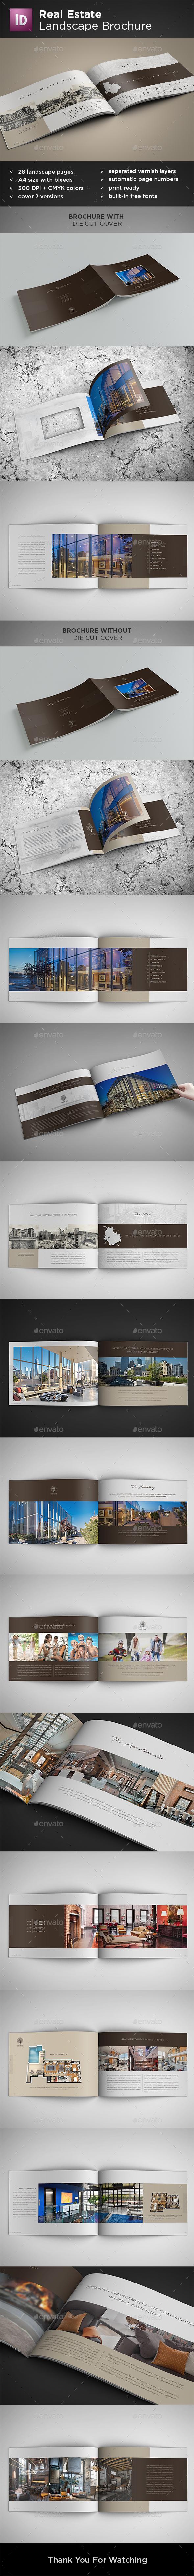 Real Estate Landscape Brochure - Brochures Print Templates